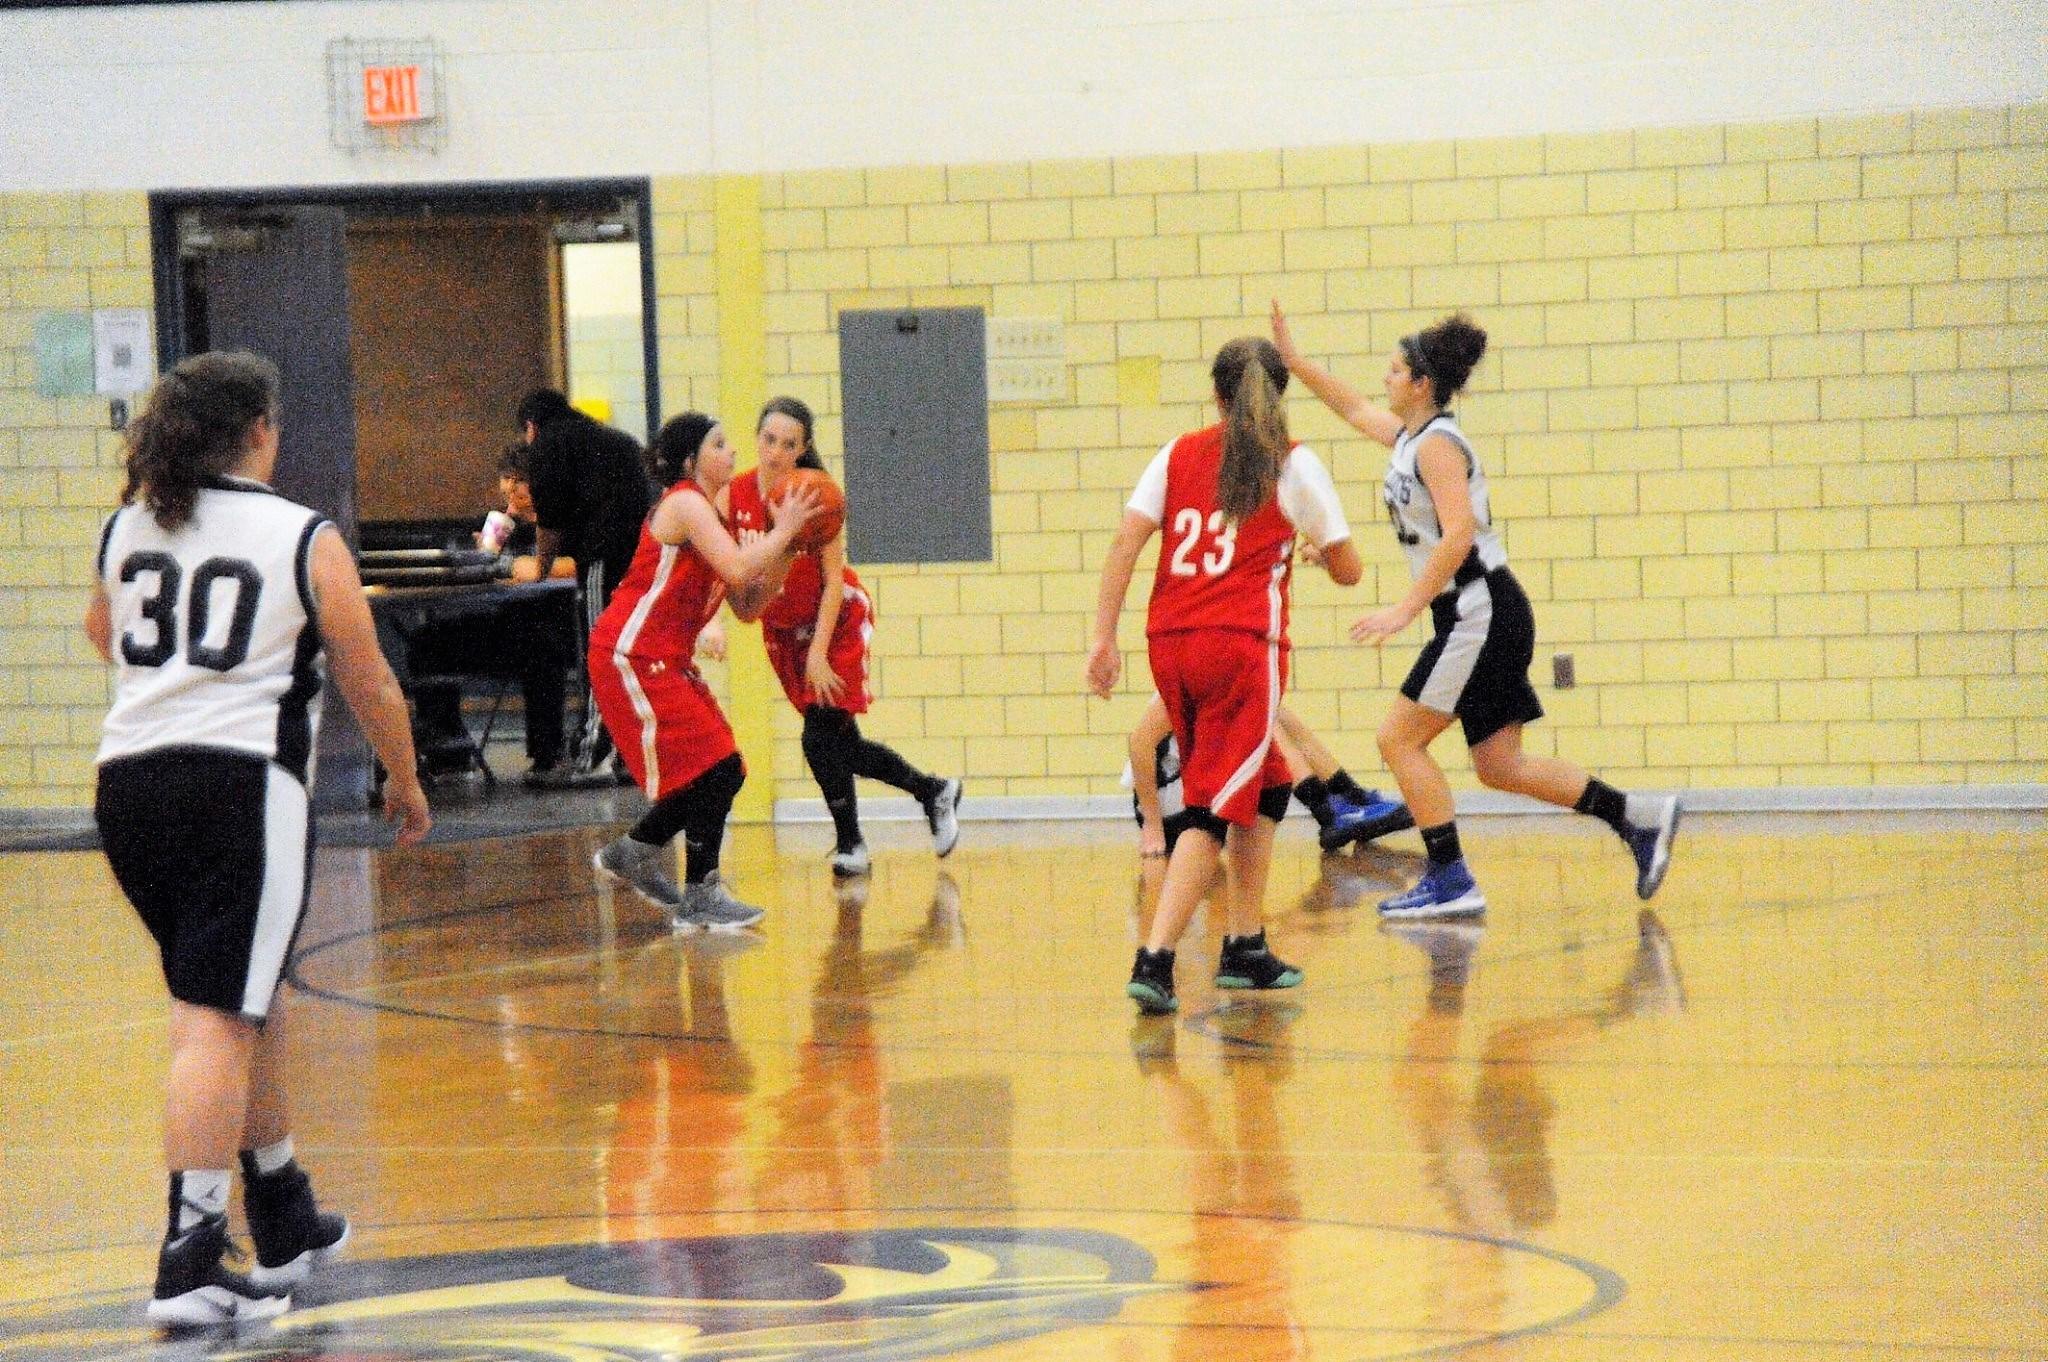 7th grade girls basketball player Hailey Kilgore